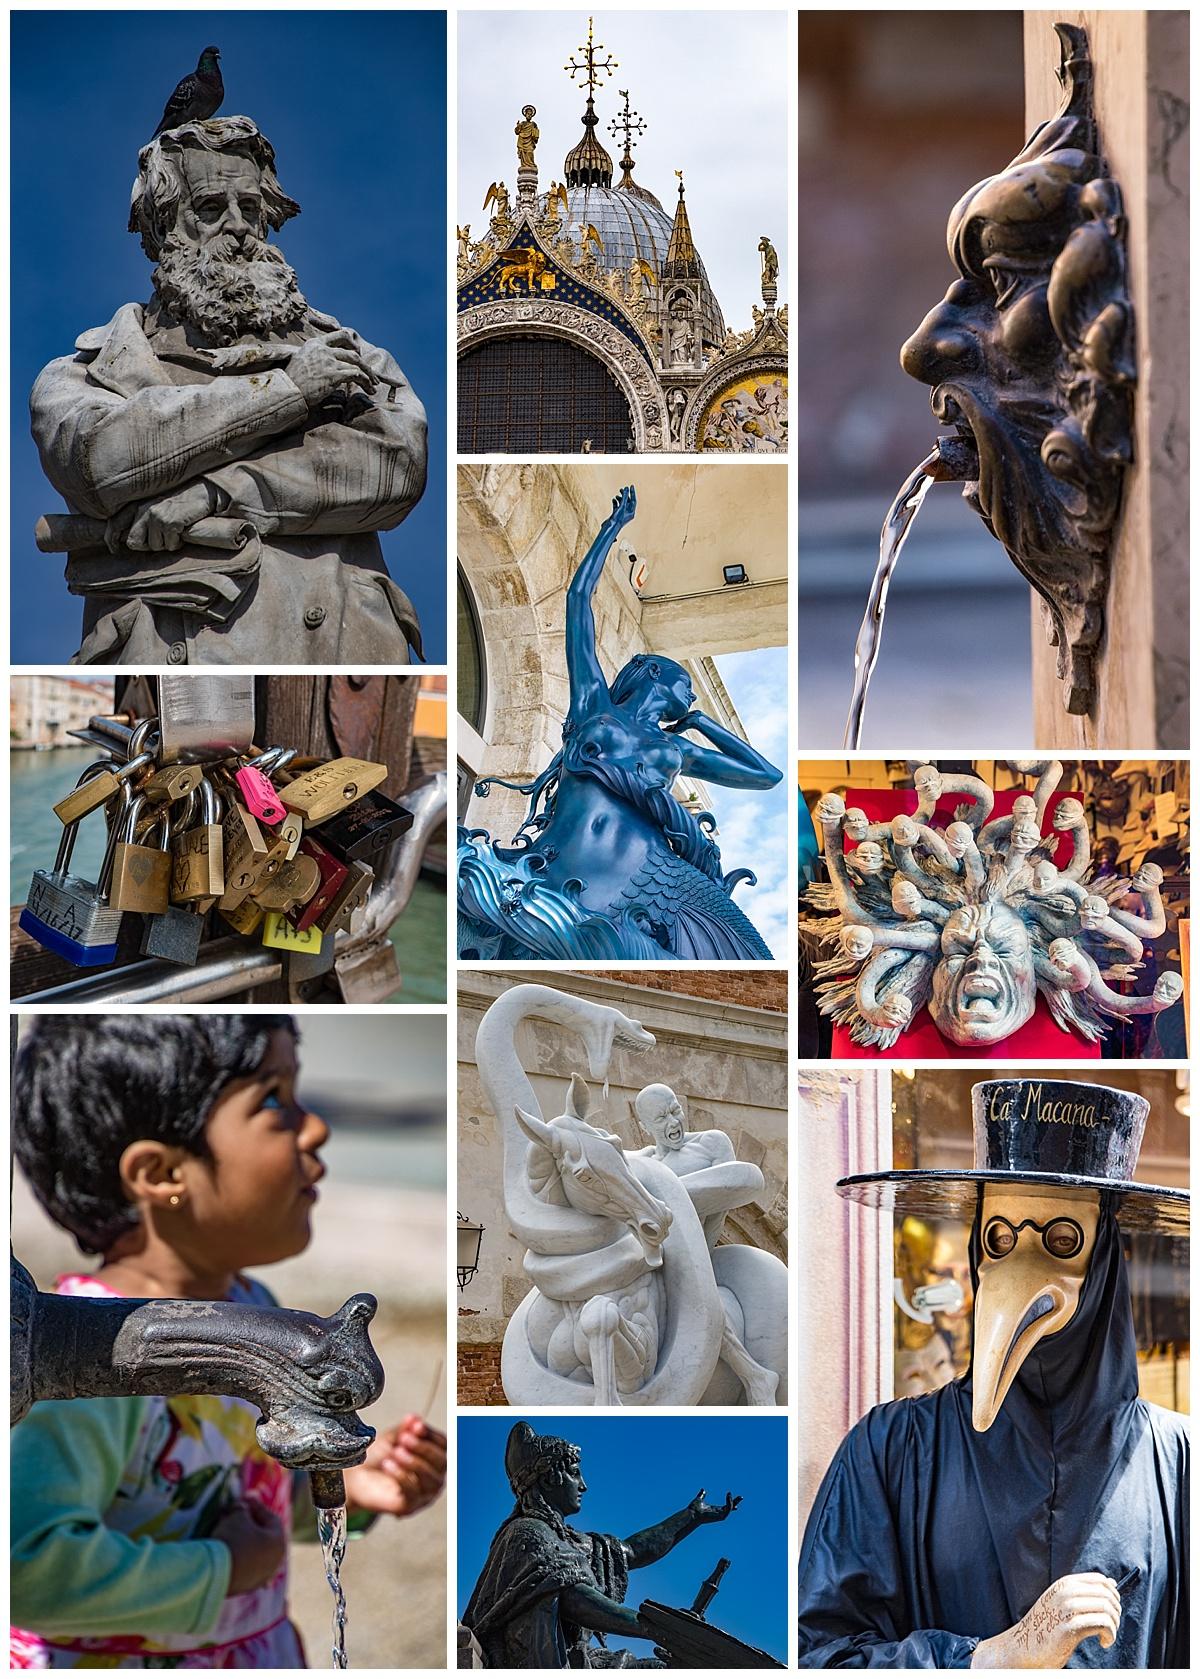 Venice, Italy - statues